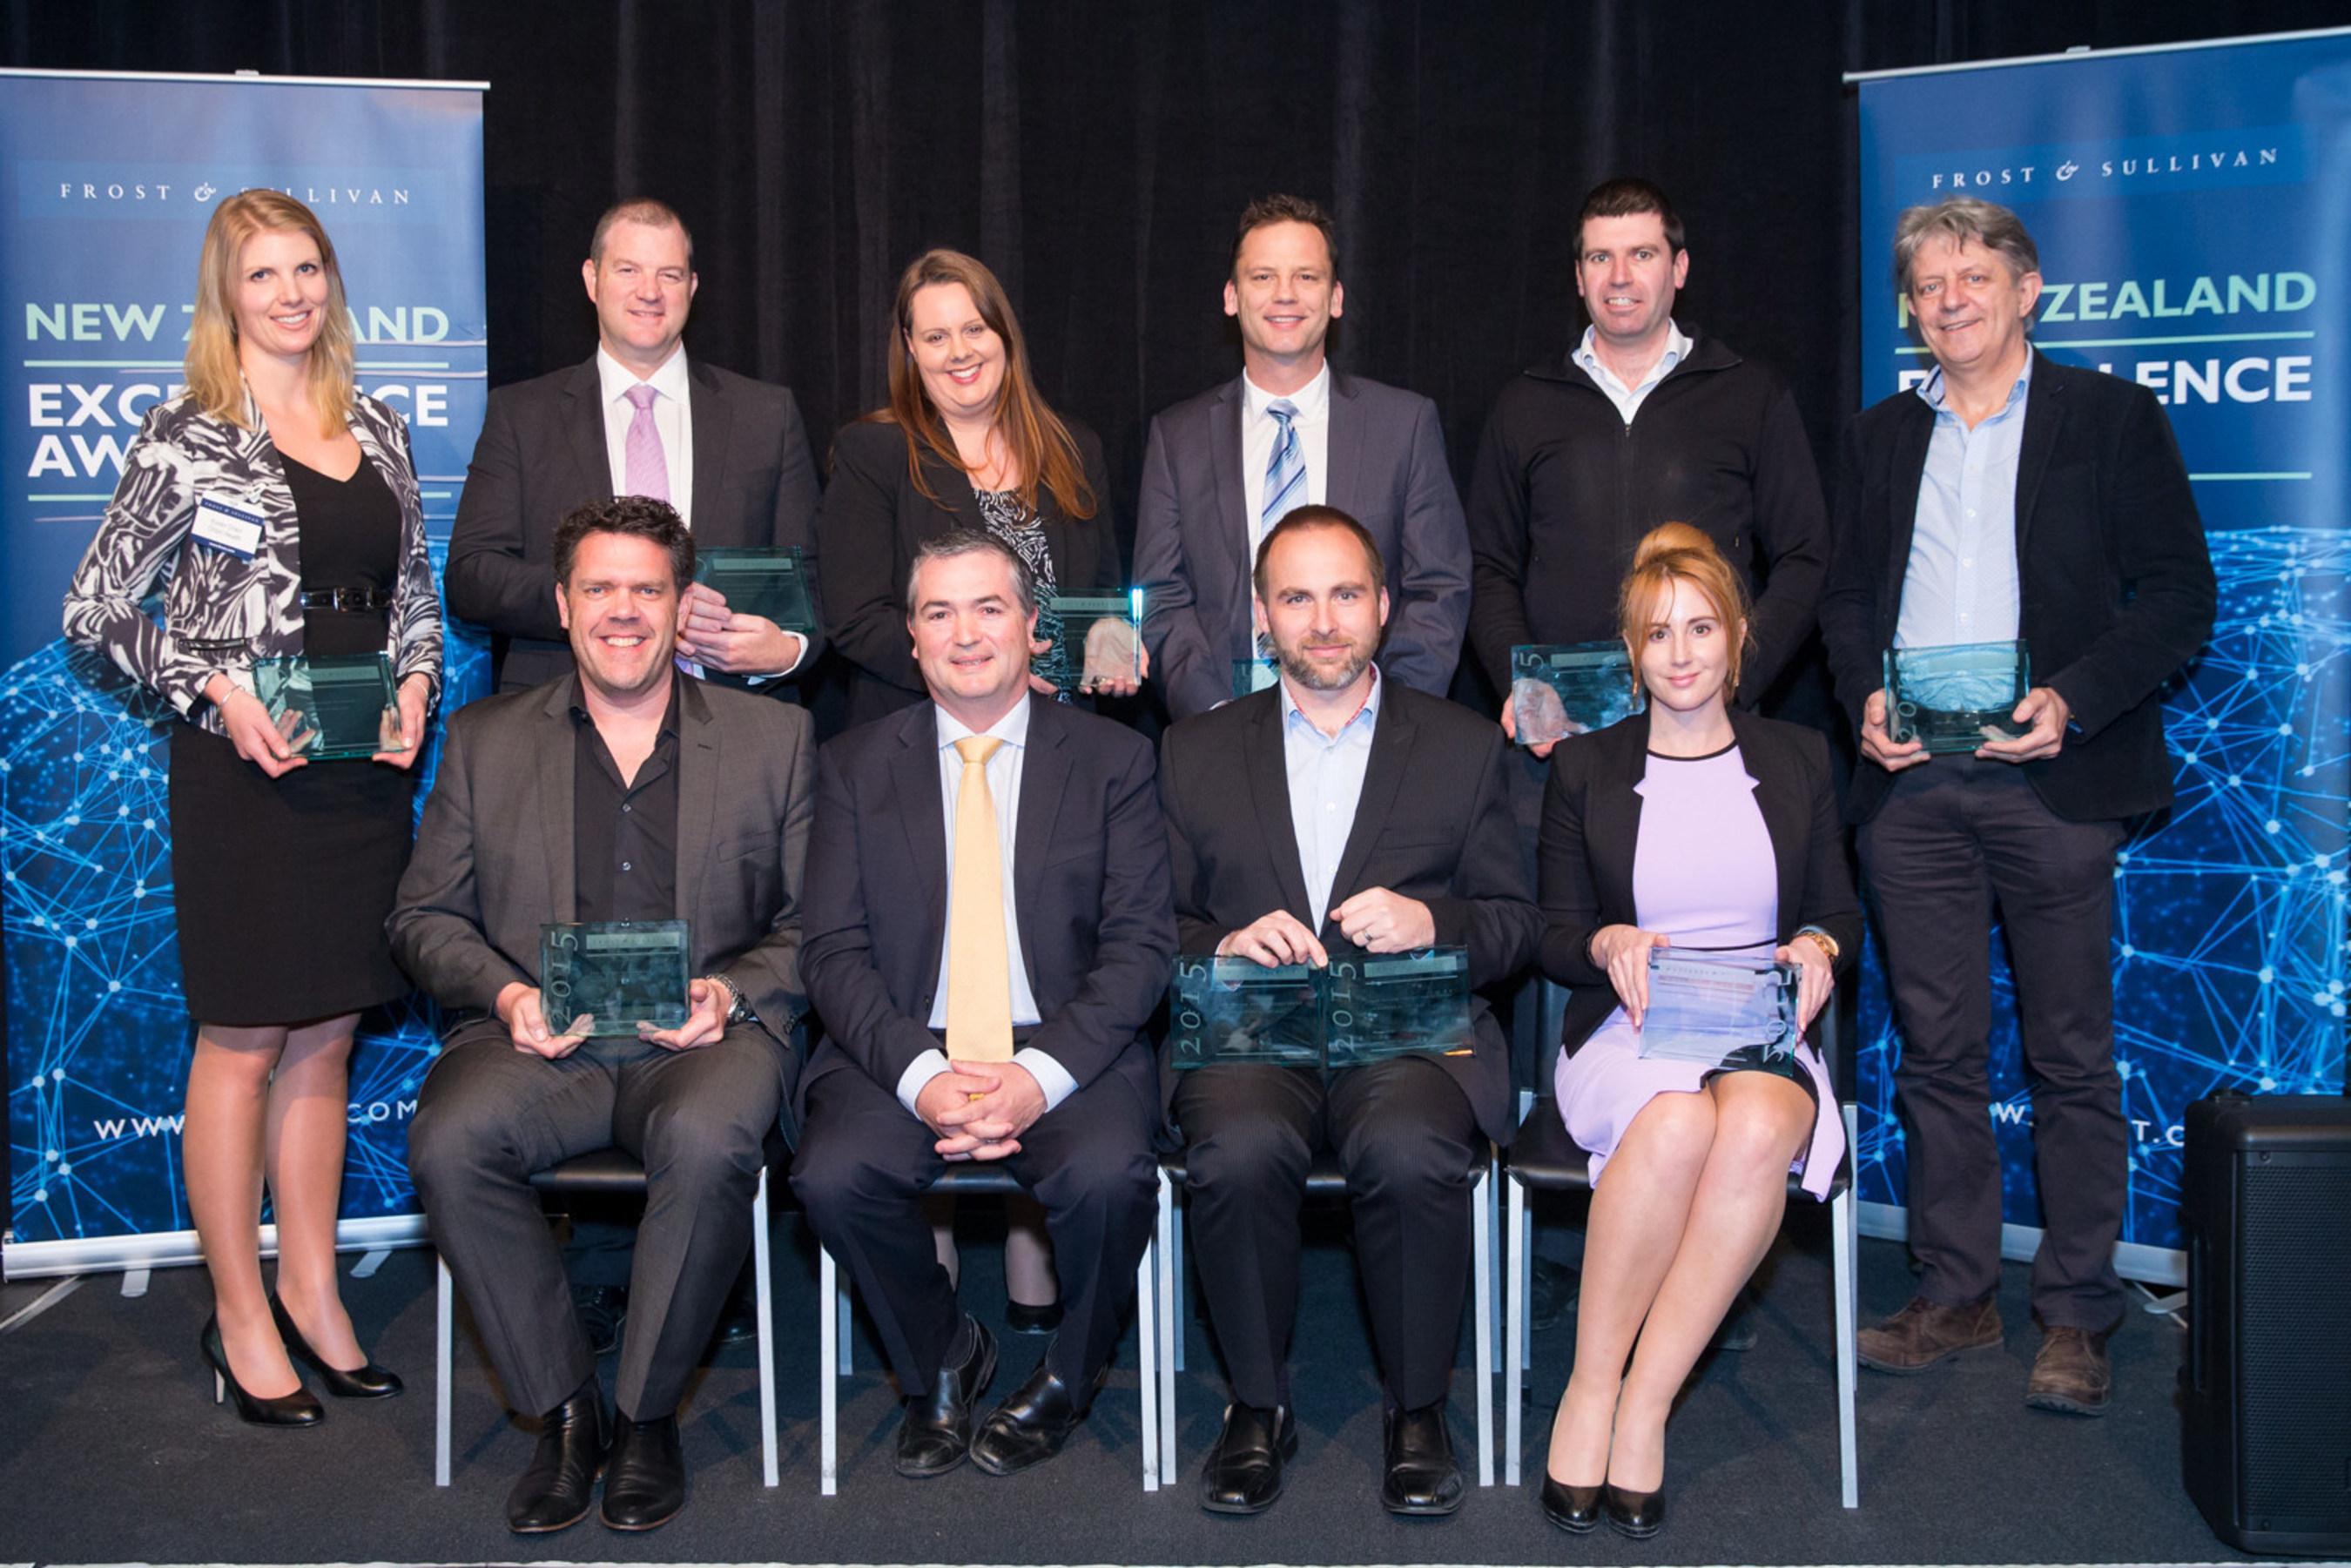 Frost & Sullivan's 2015 New Zealand Excellence Awards Recognises 13 of New Zealand's Best Across 6